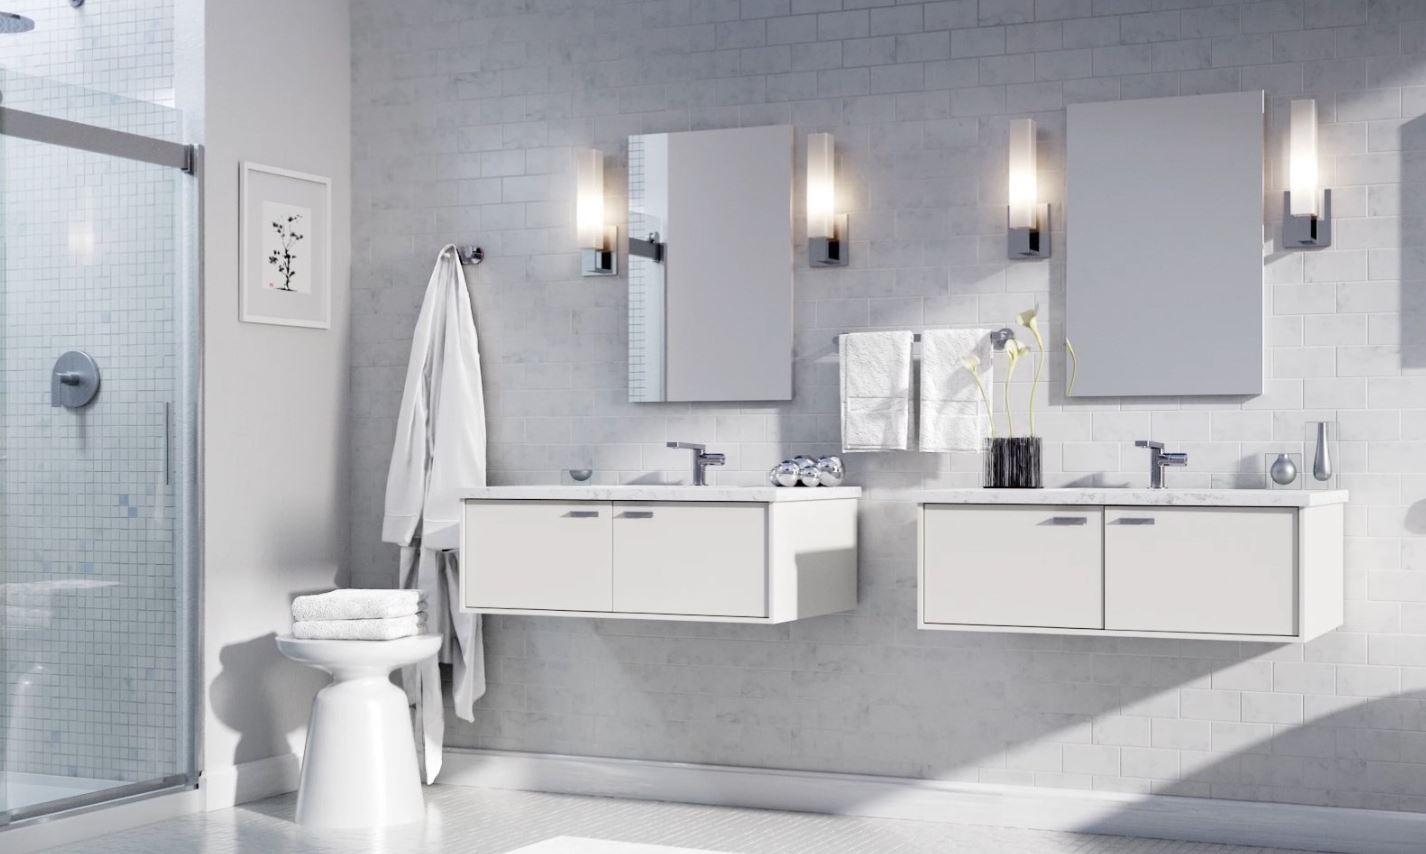 Kohler is building world\'s smartest bathroom based on Microsoft\'s ...